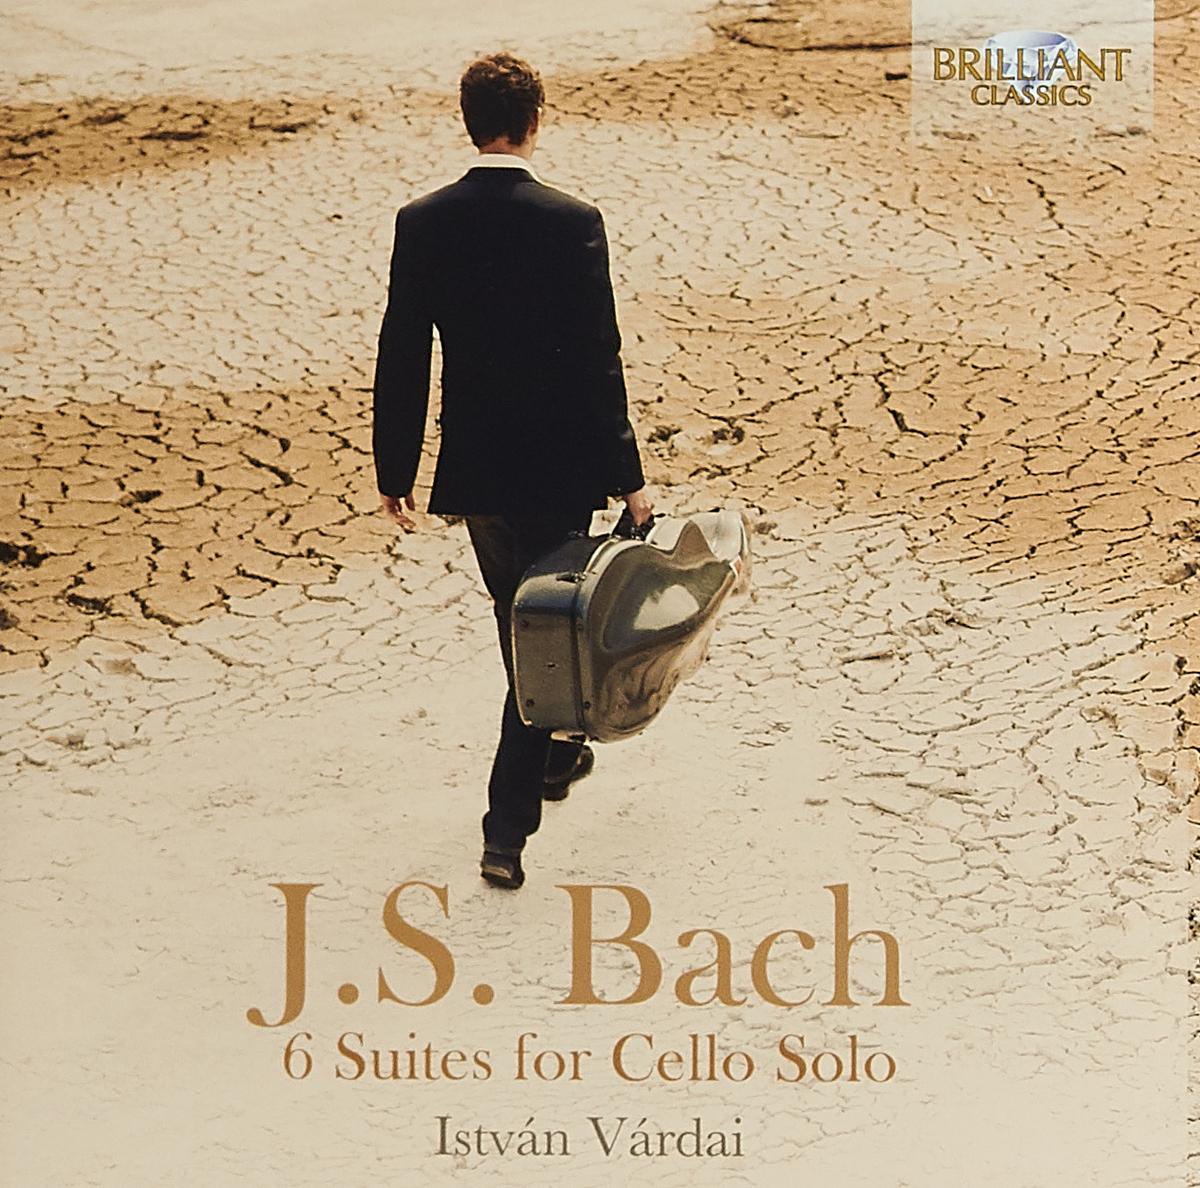 лучшая цена Иоганн Себастьян Бах J.s. Bach. 6 Suites For Solo Cello B (2 CD)